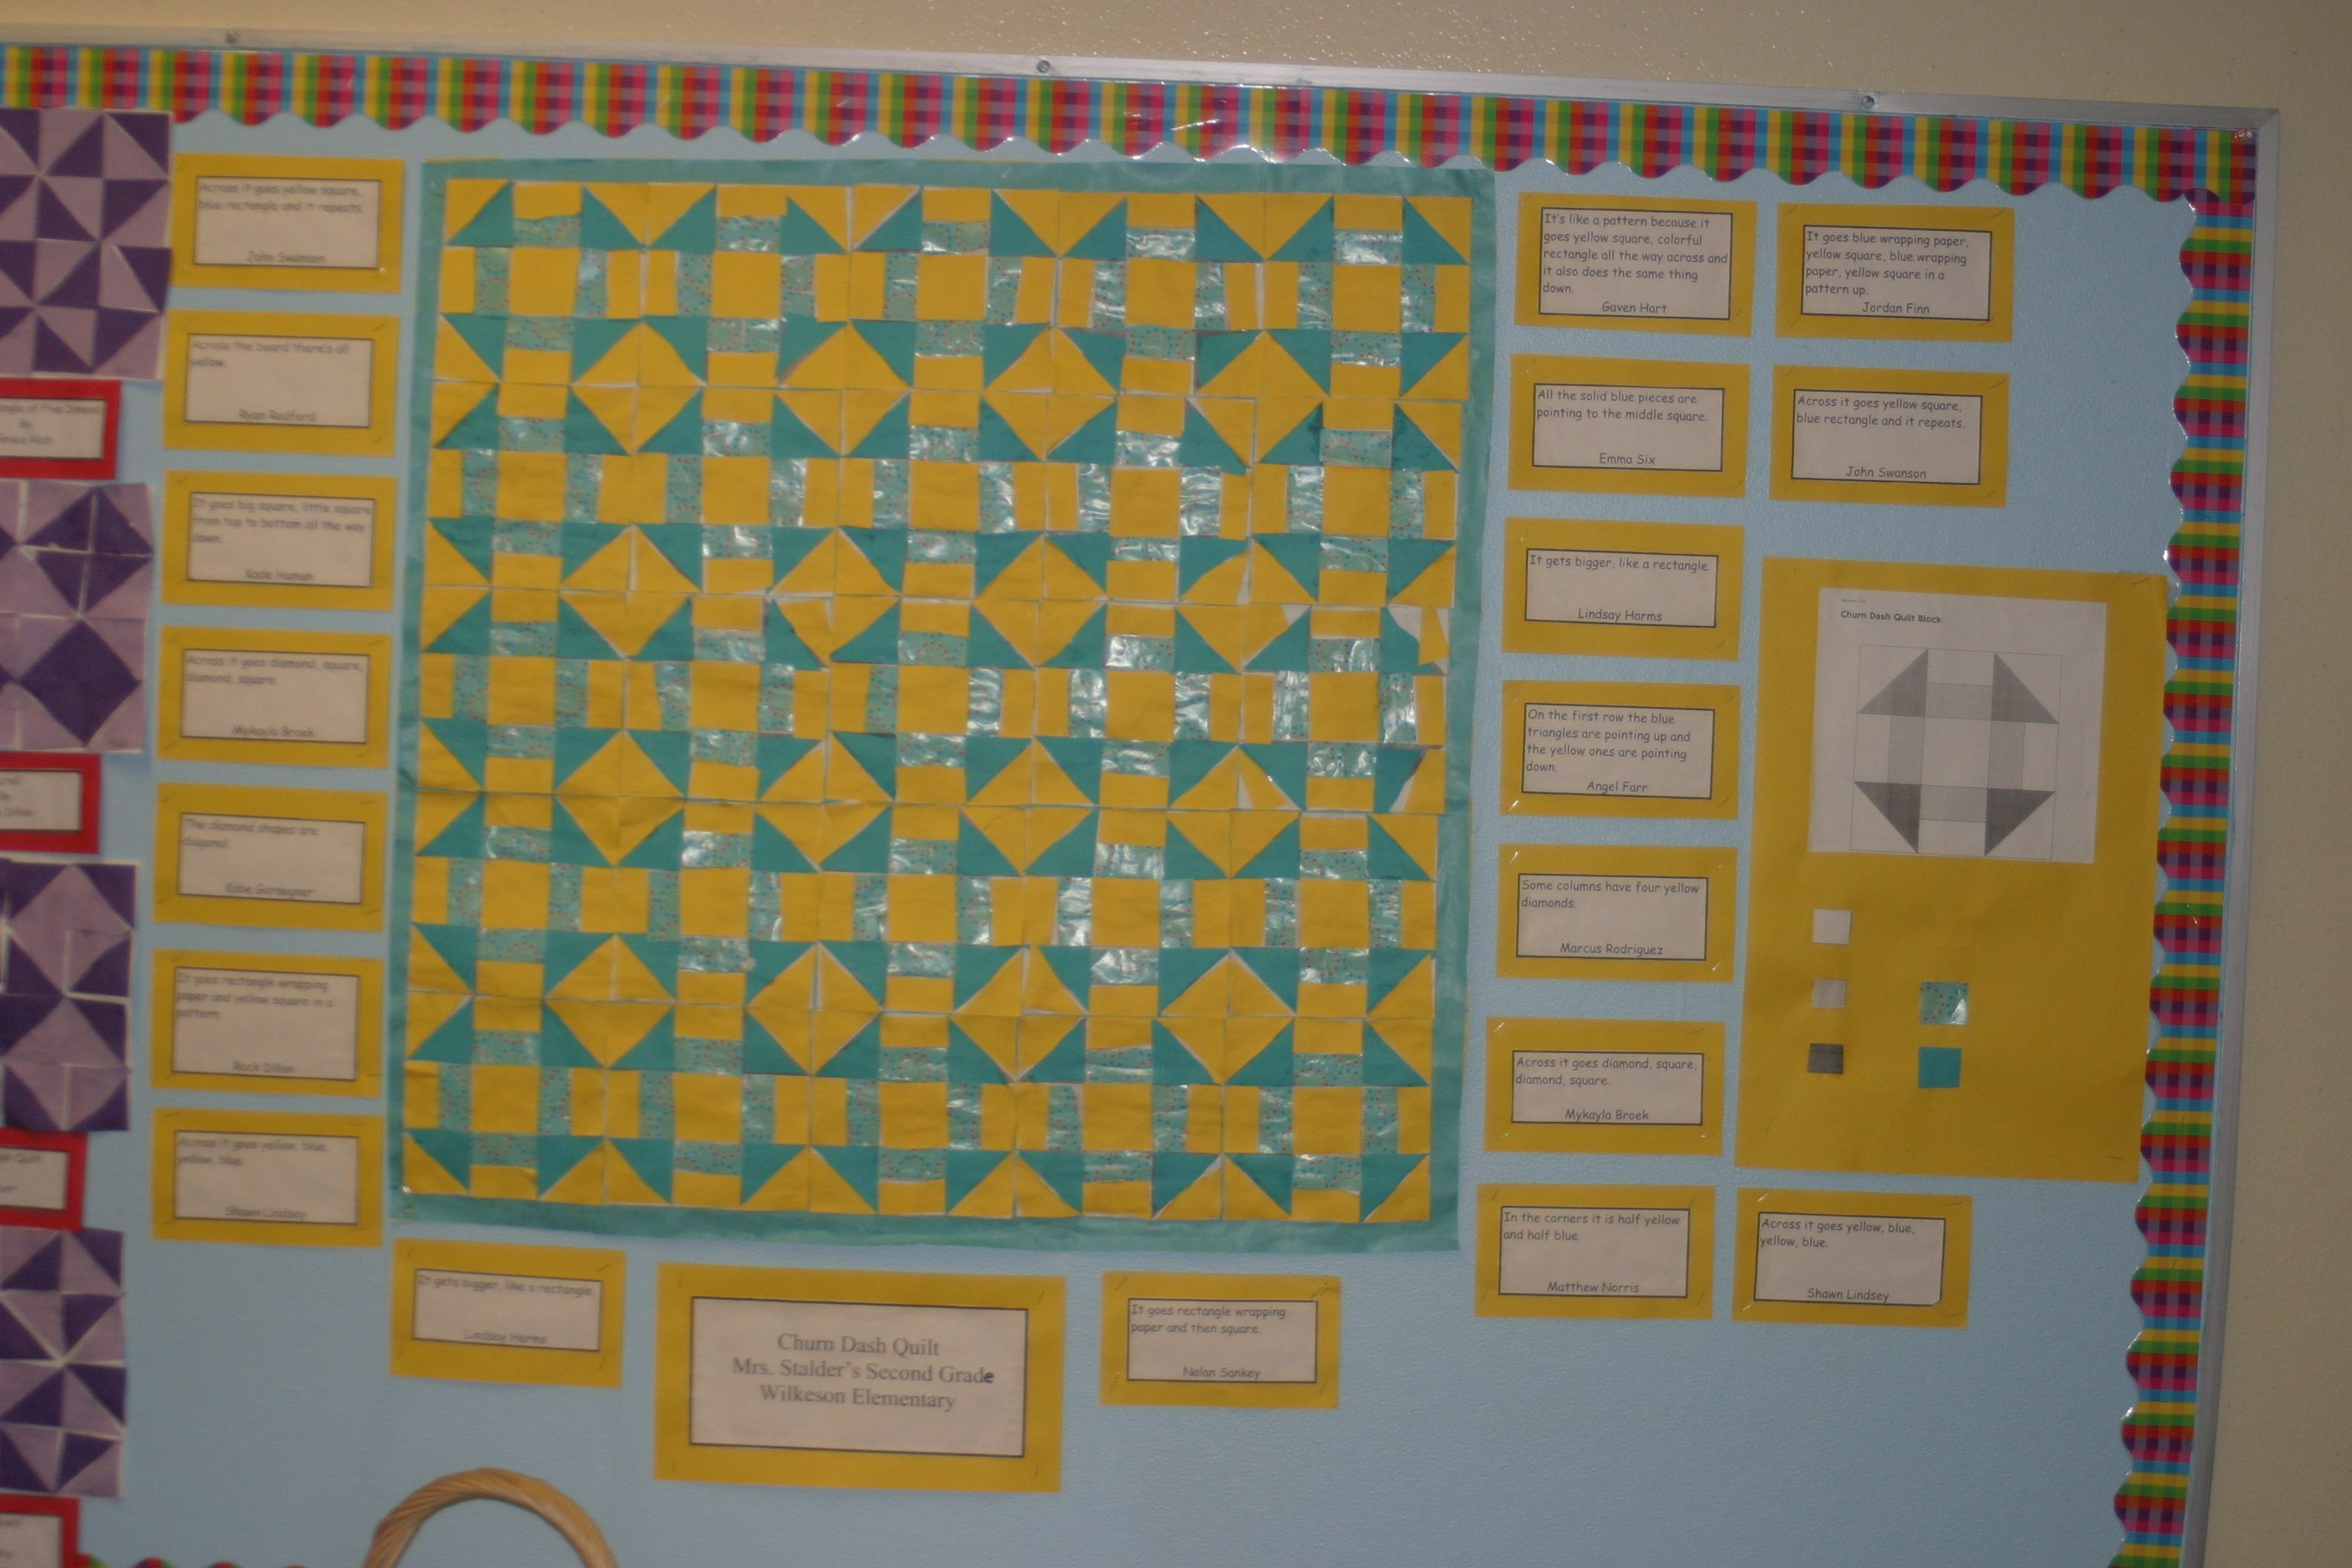 Bridges Math 2nd Grade Paper Quilt Built By Kids With Observations Around It Bridges Math Math Worksheets Bridges Math Curriculum [ 2048 x 3072 Pixel ]